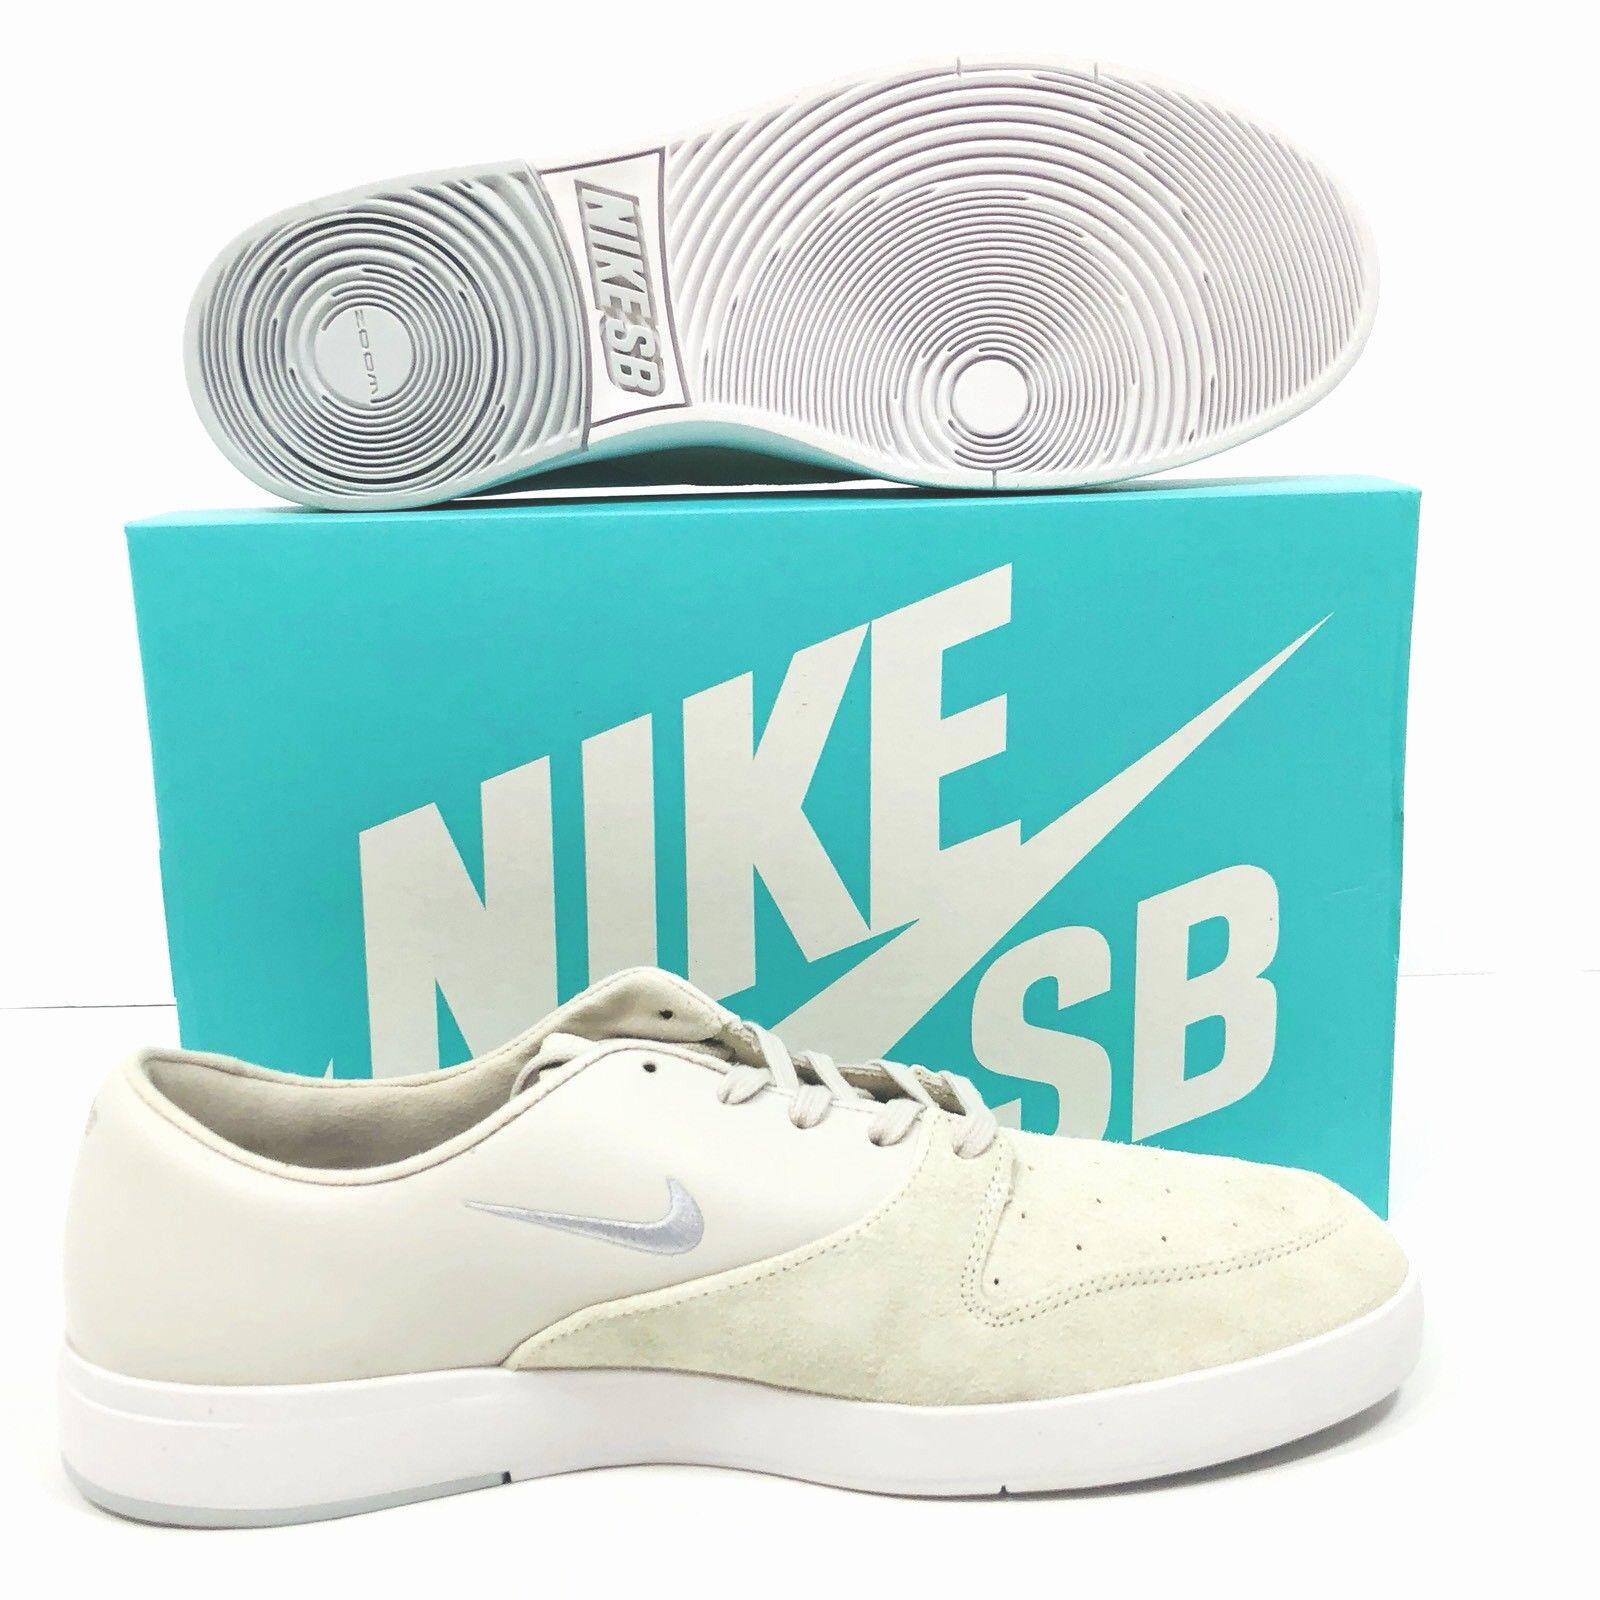 various colors 594fe 7f7d5 Nike SB Zoom Mens White Size 12 Paul Rodriguez Rodriguez Rodriguez  Skateboarding Shoe 918304-101